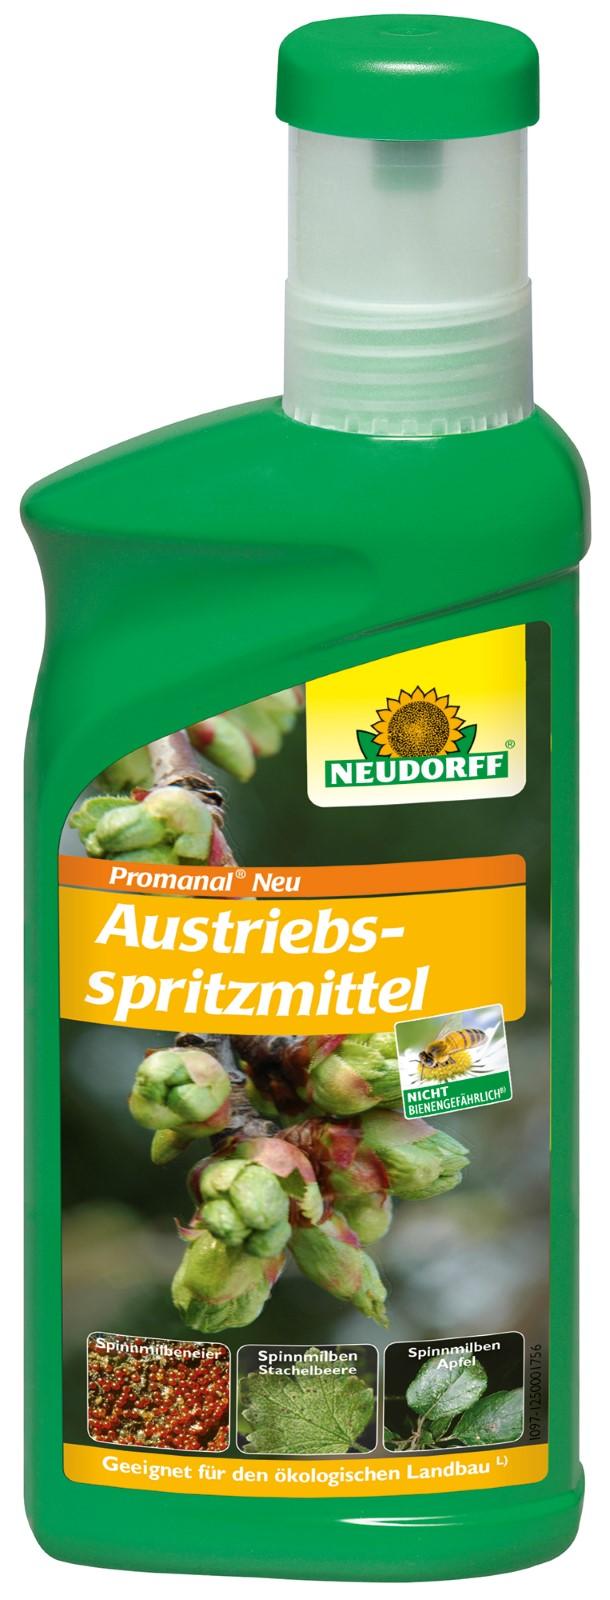 Neudorff Promanal Austriebsspritzmittel 500 ml